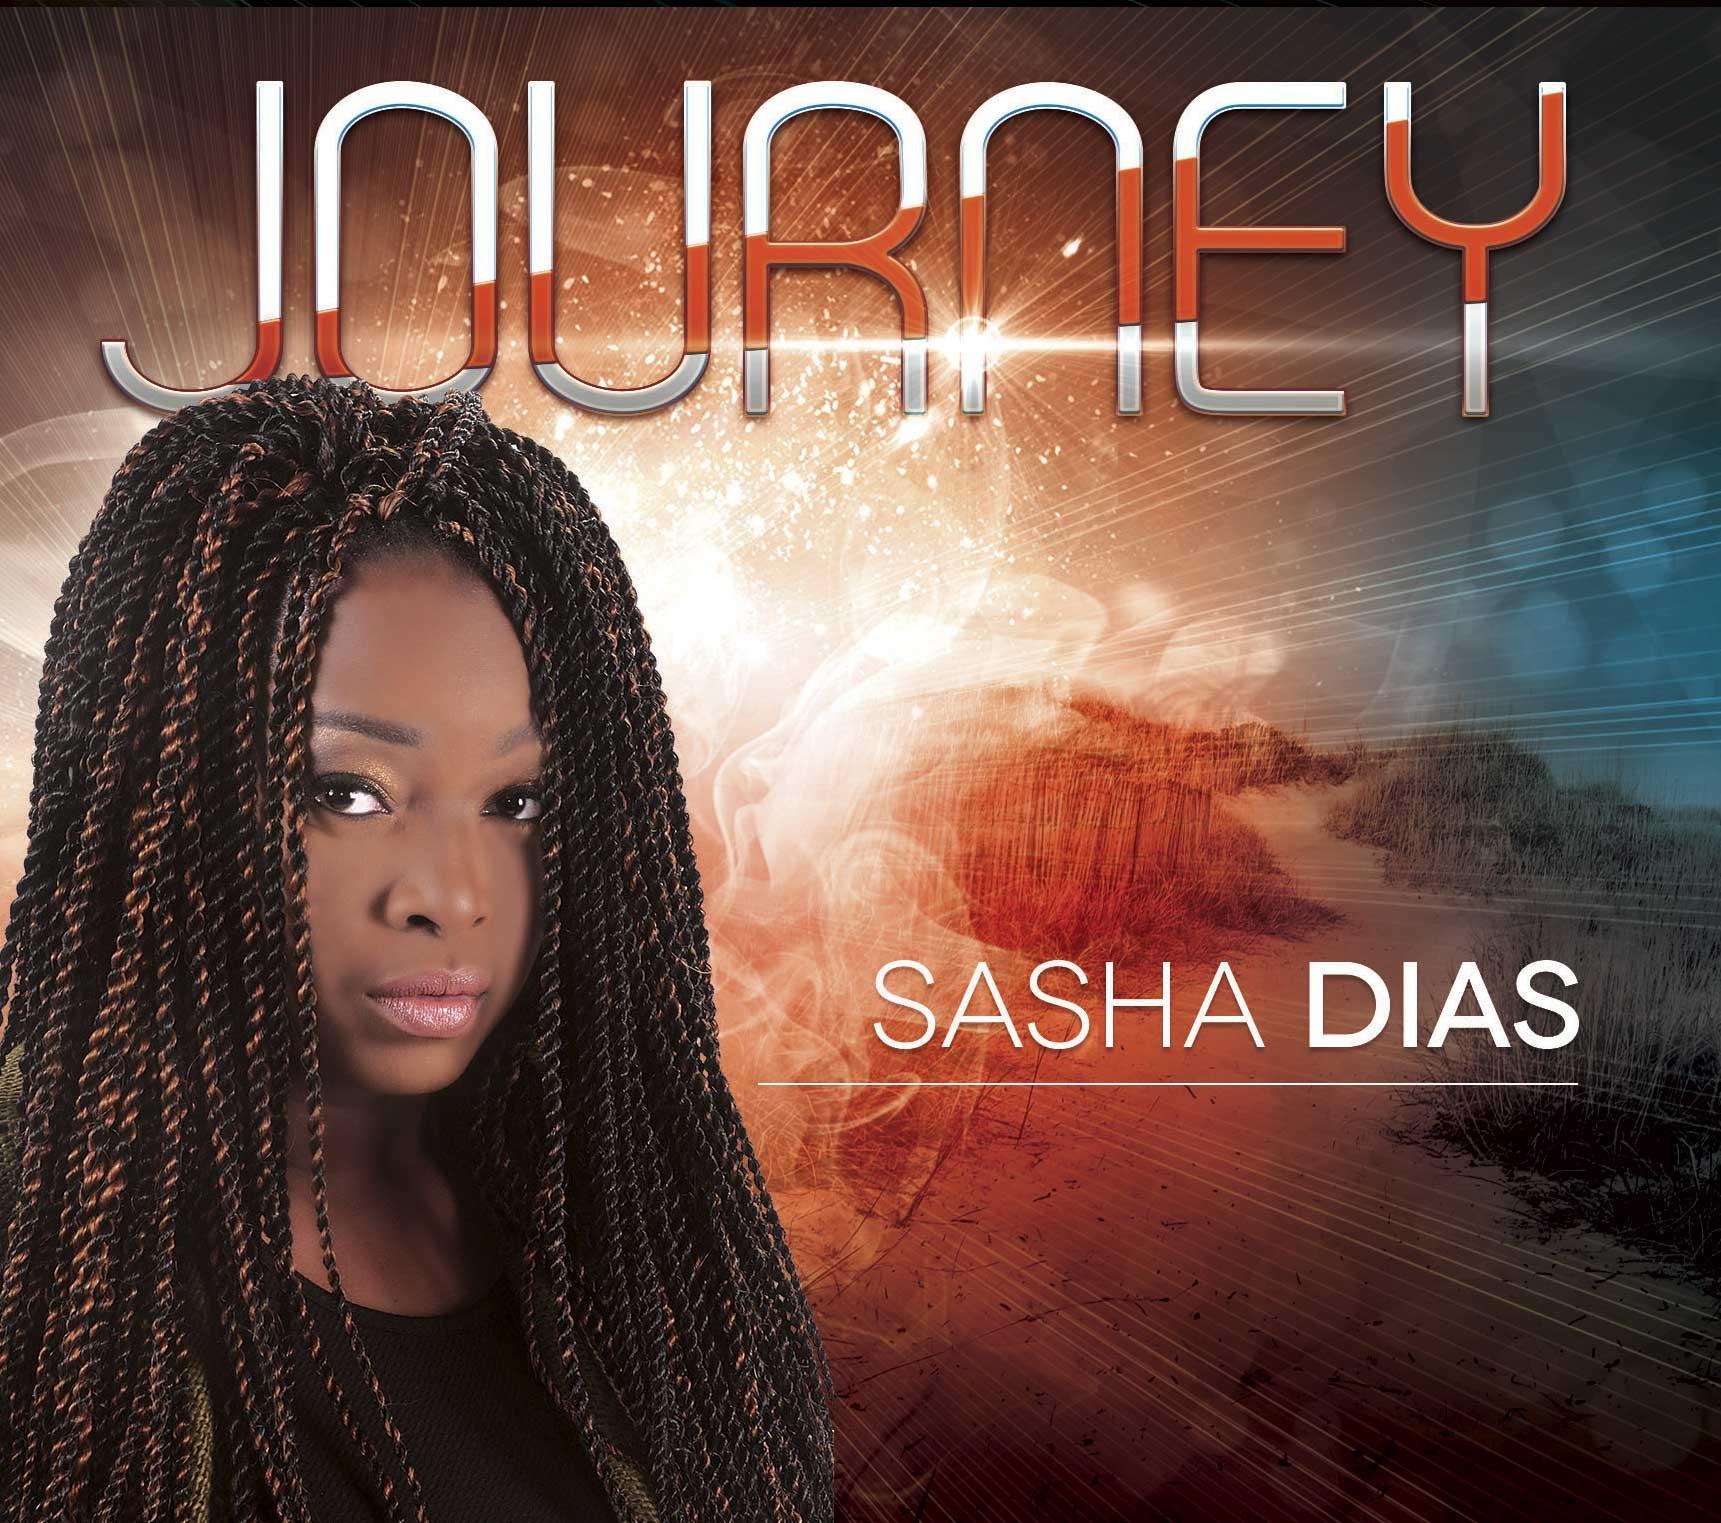 CD : Sasha Dias - Journey (CD)